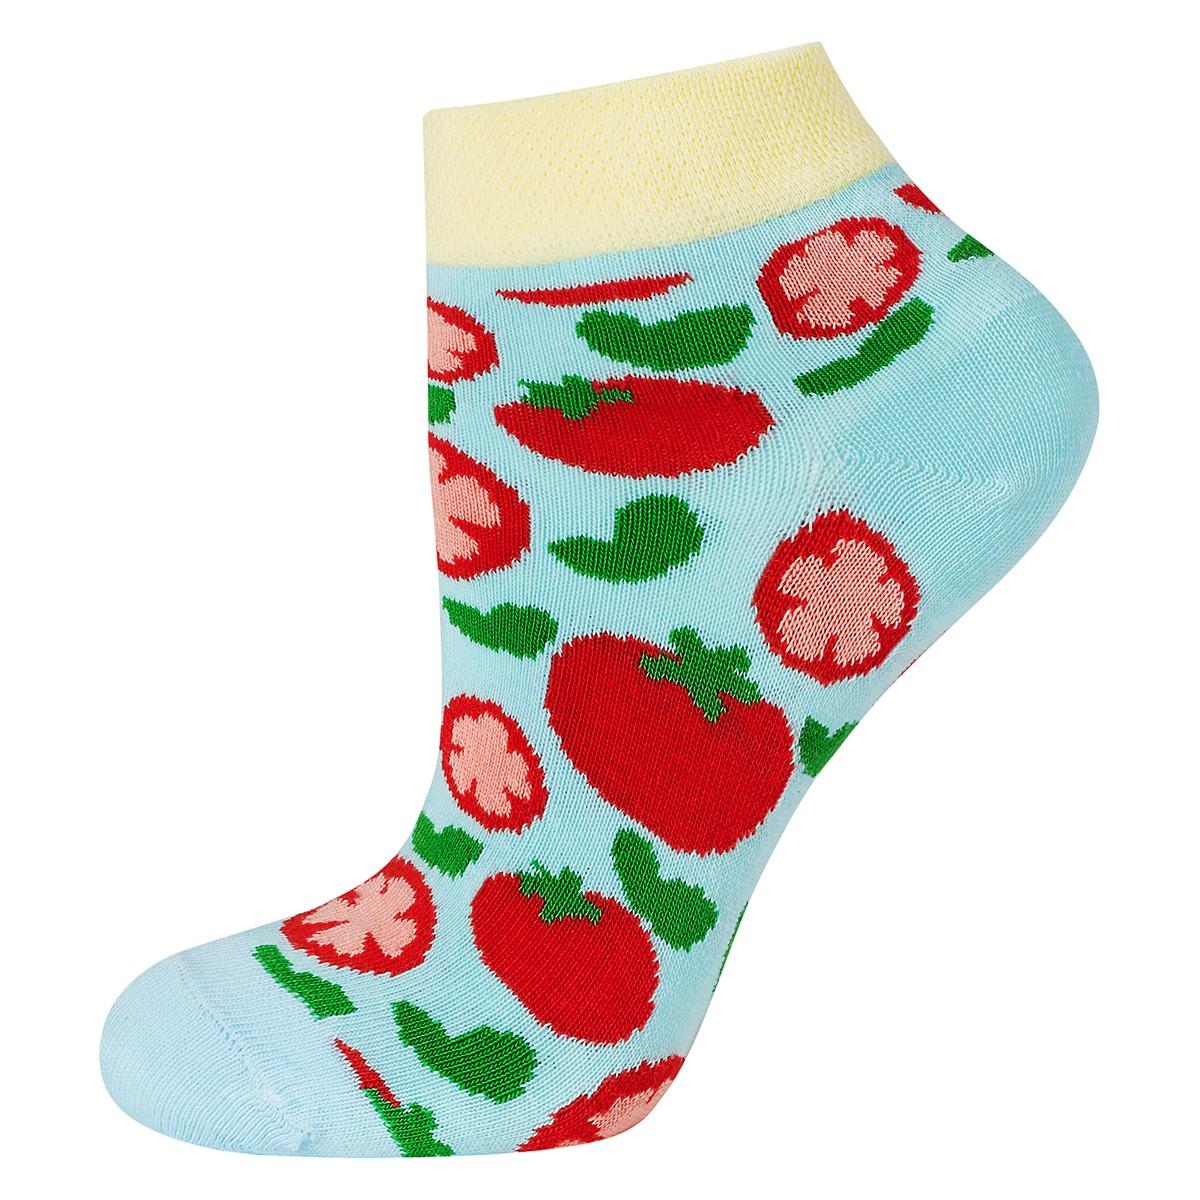 Stopki DAMSKIE SOXO seria GOOD STUFF wzór Pomidory